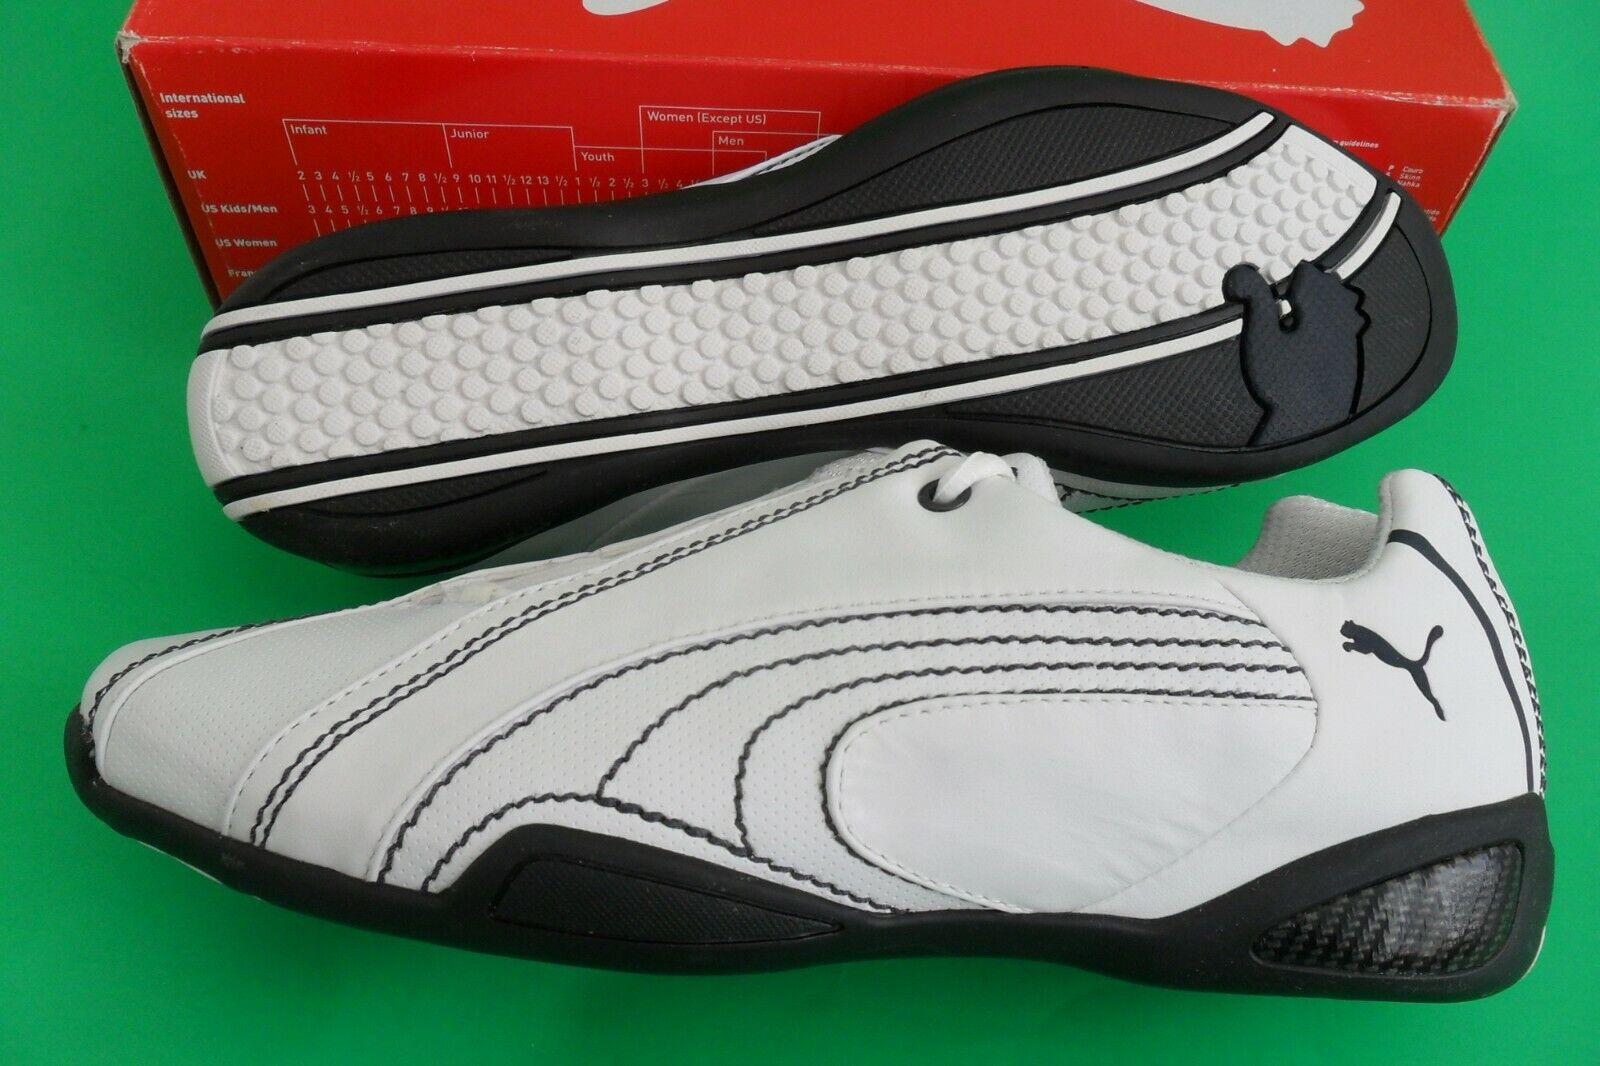 online economico VERY RAREnbPumaPANIGALE 50cat future Racing speed speed speed MOTORSPORT ShoeMen sz 7.5  Spedizione gratuita al 100%